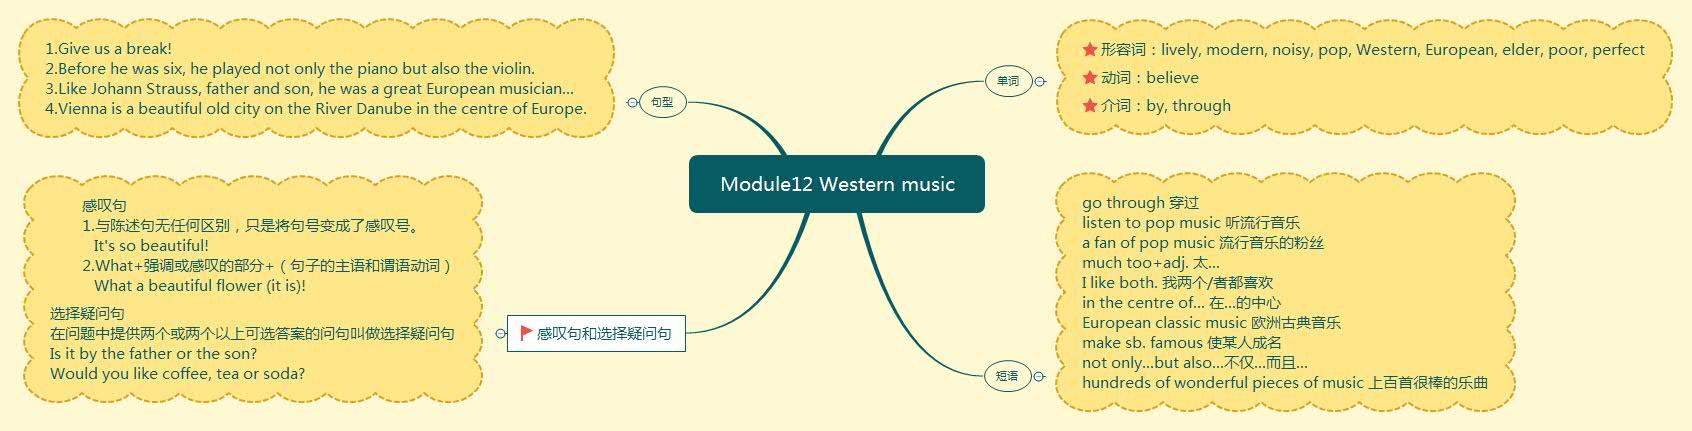 Module12 Western music.jpg